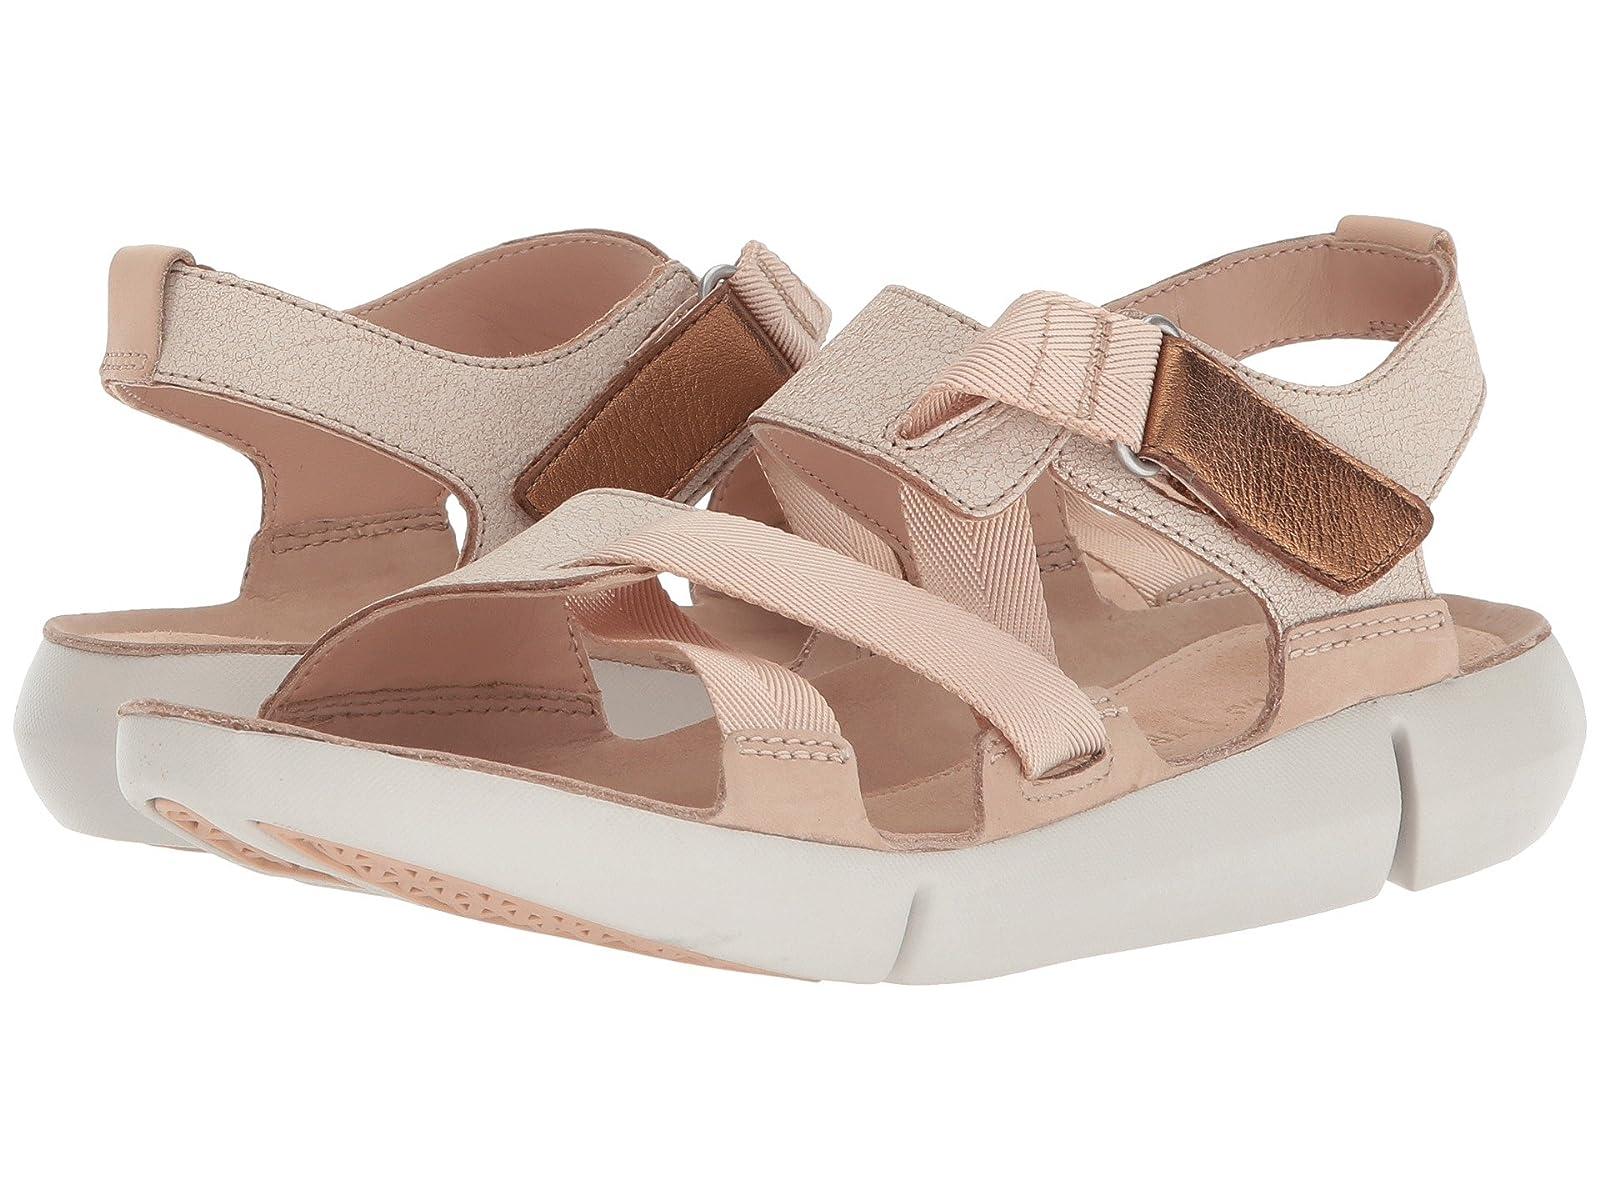 Clarks Tri CloverCheap and distinctive eye-catching shoes